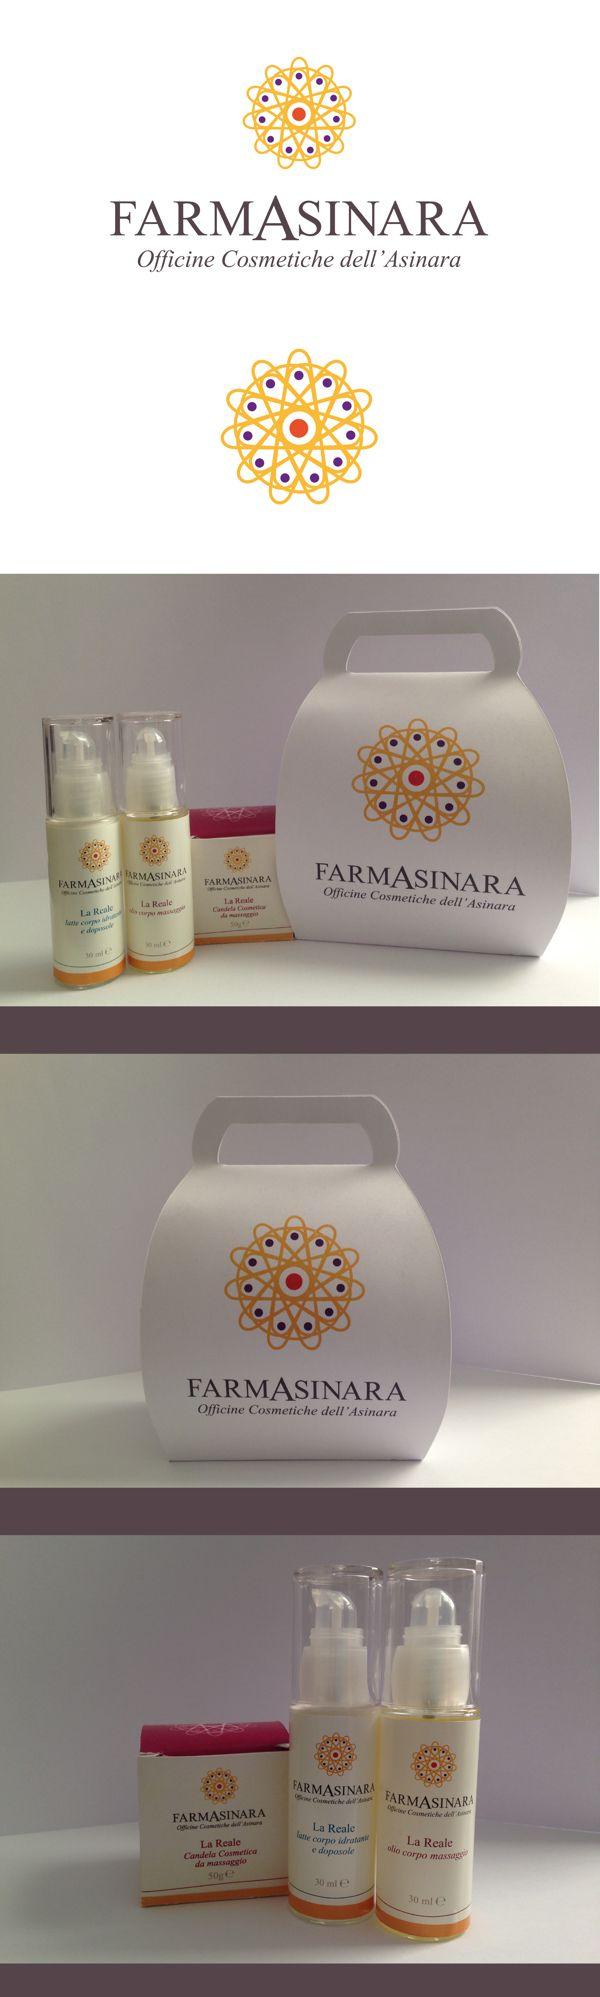 FarmAsinara by Juri Masoni, via Behance